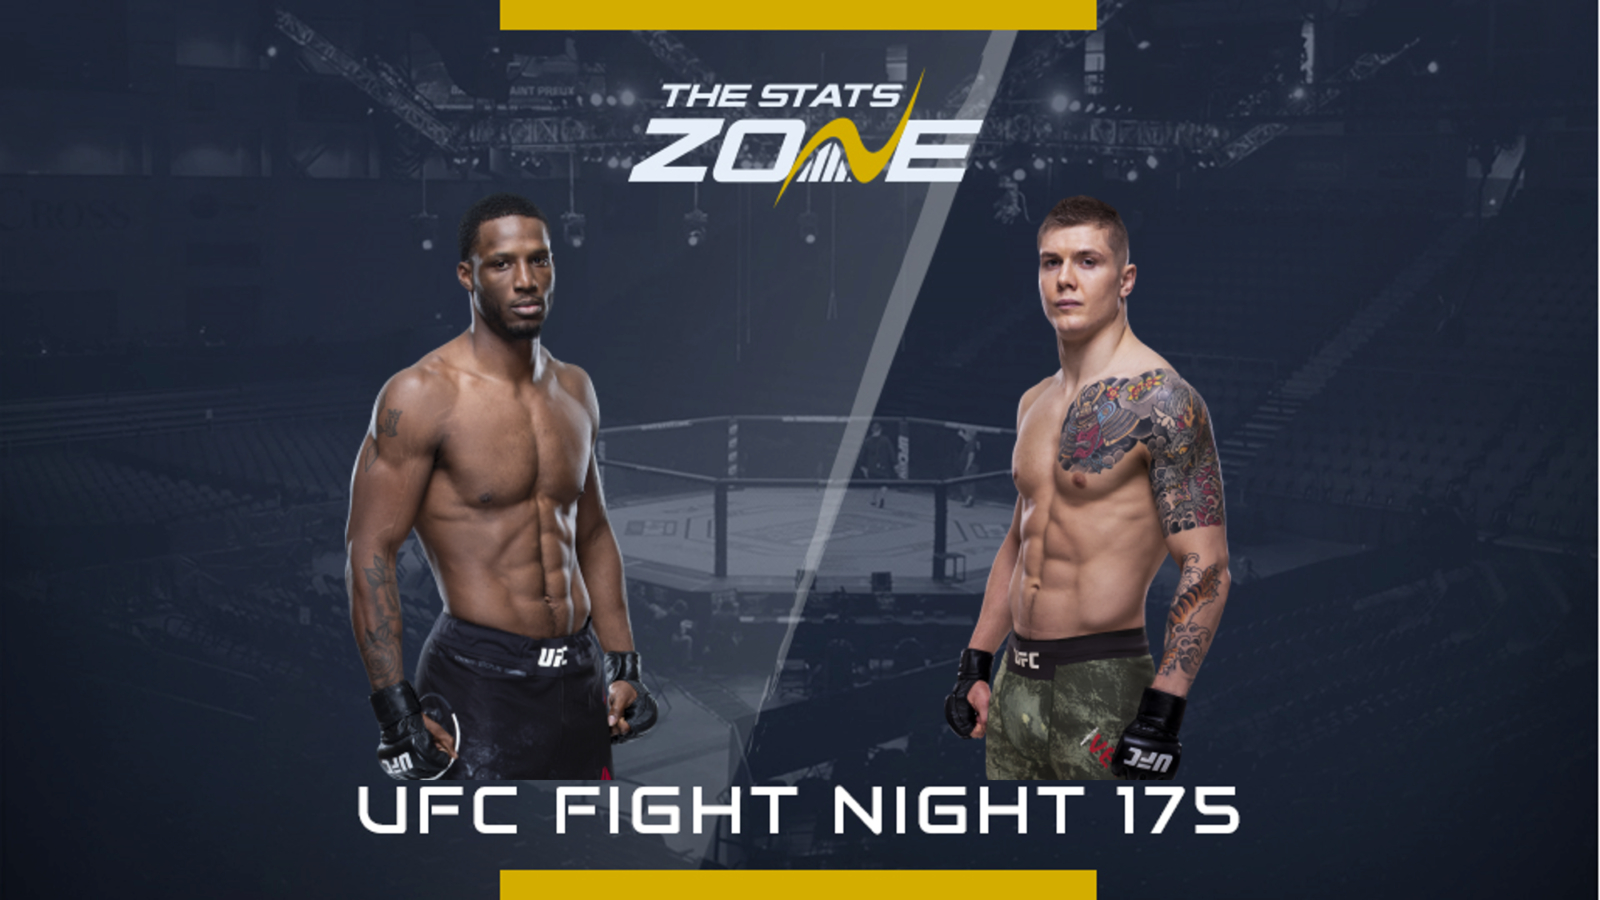 Watch UFC Fight Night 175 Smith Vs Teixeira 5/13/20